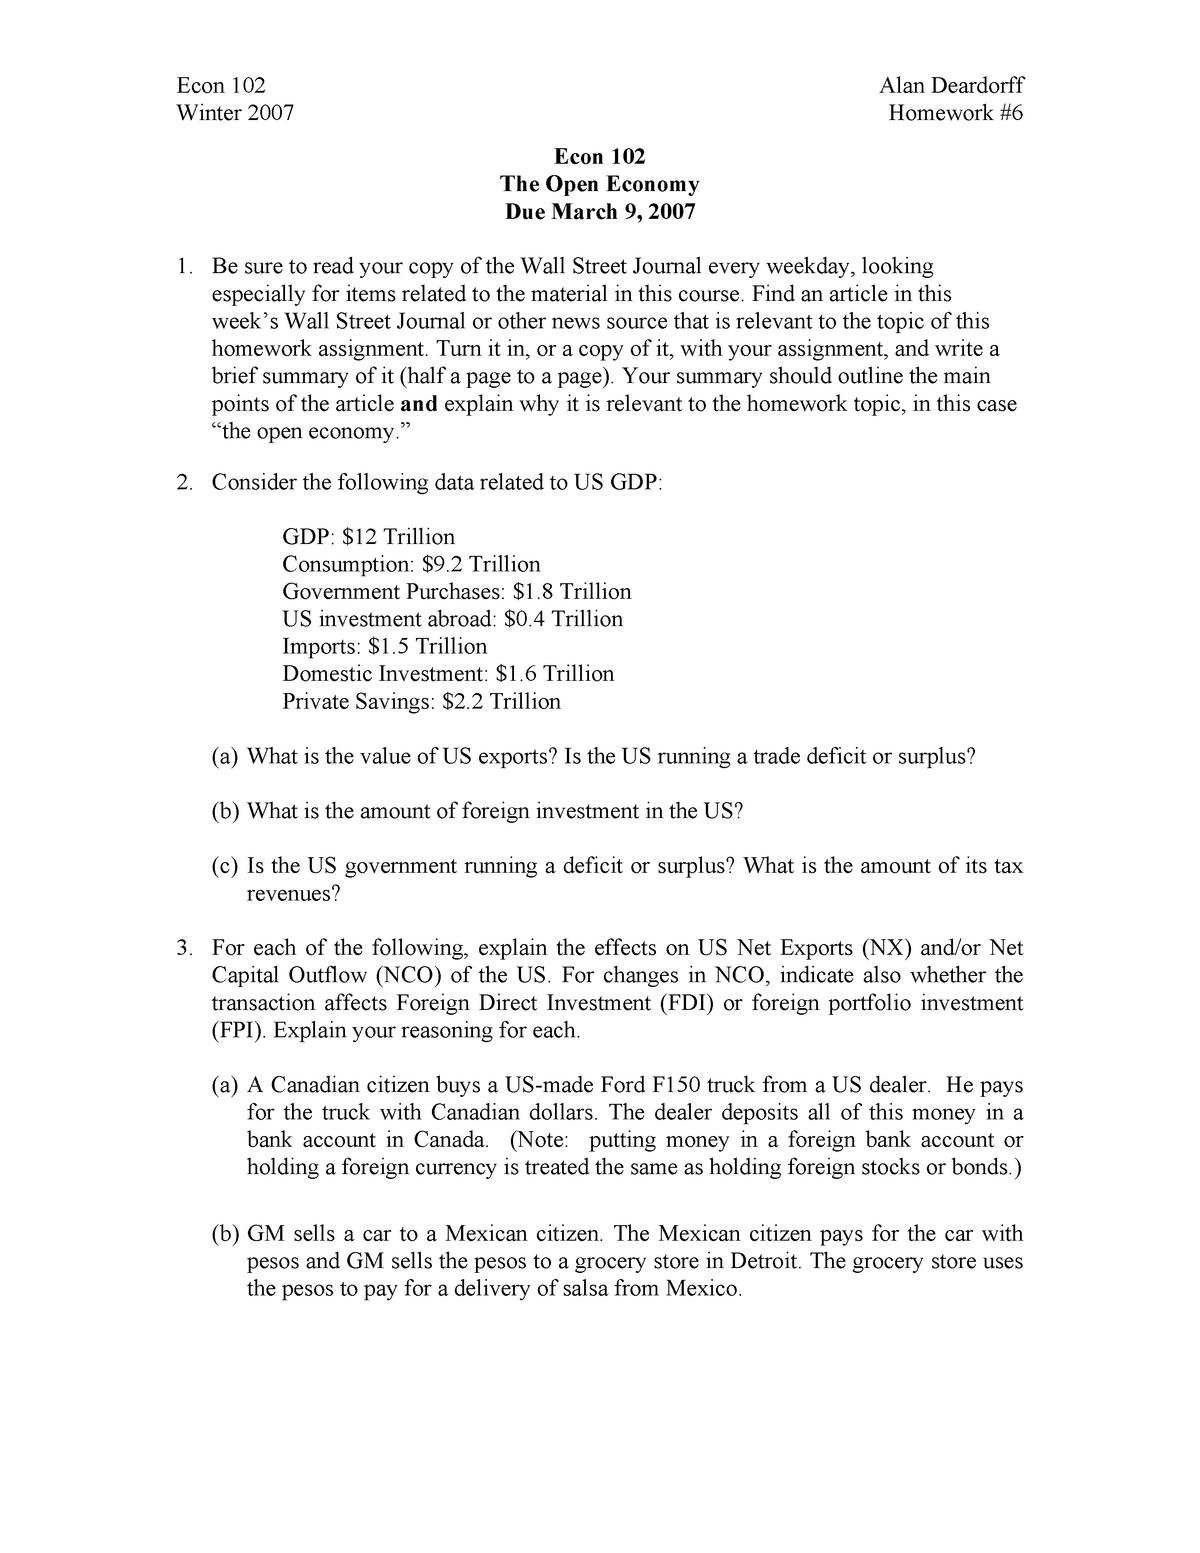 Seminar assignments - Homework assignment 6 - ECON 102